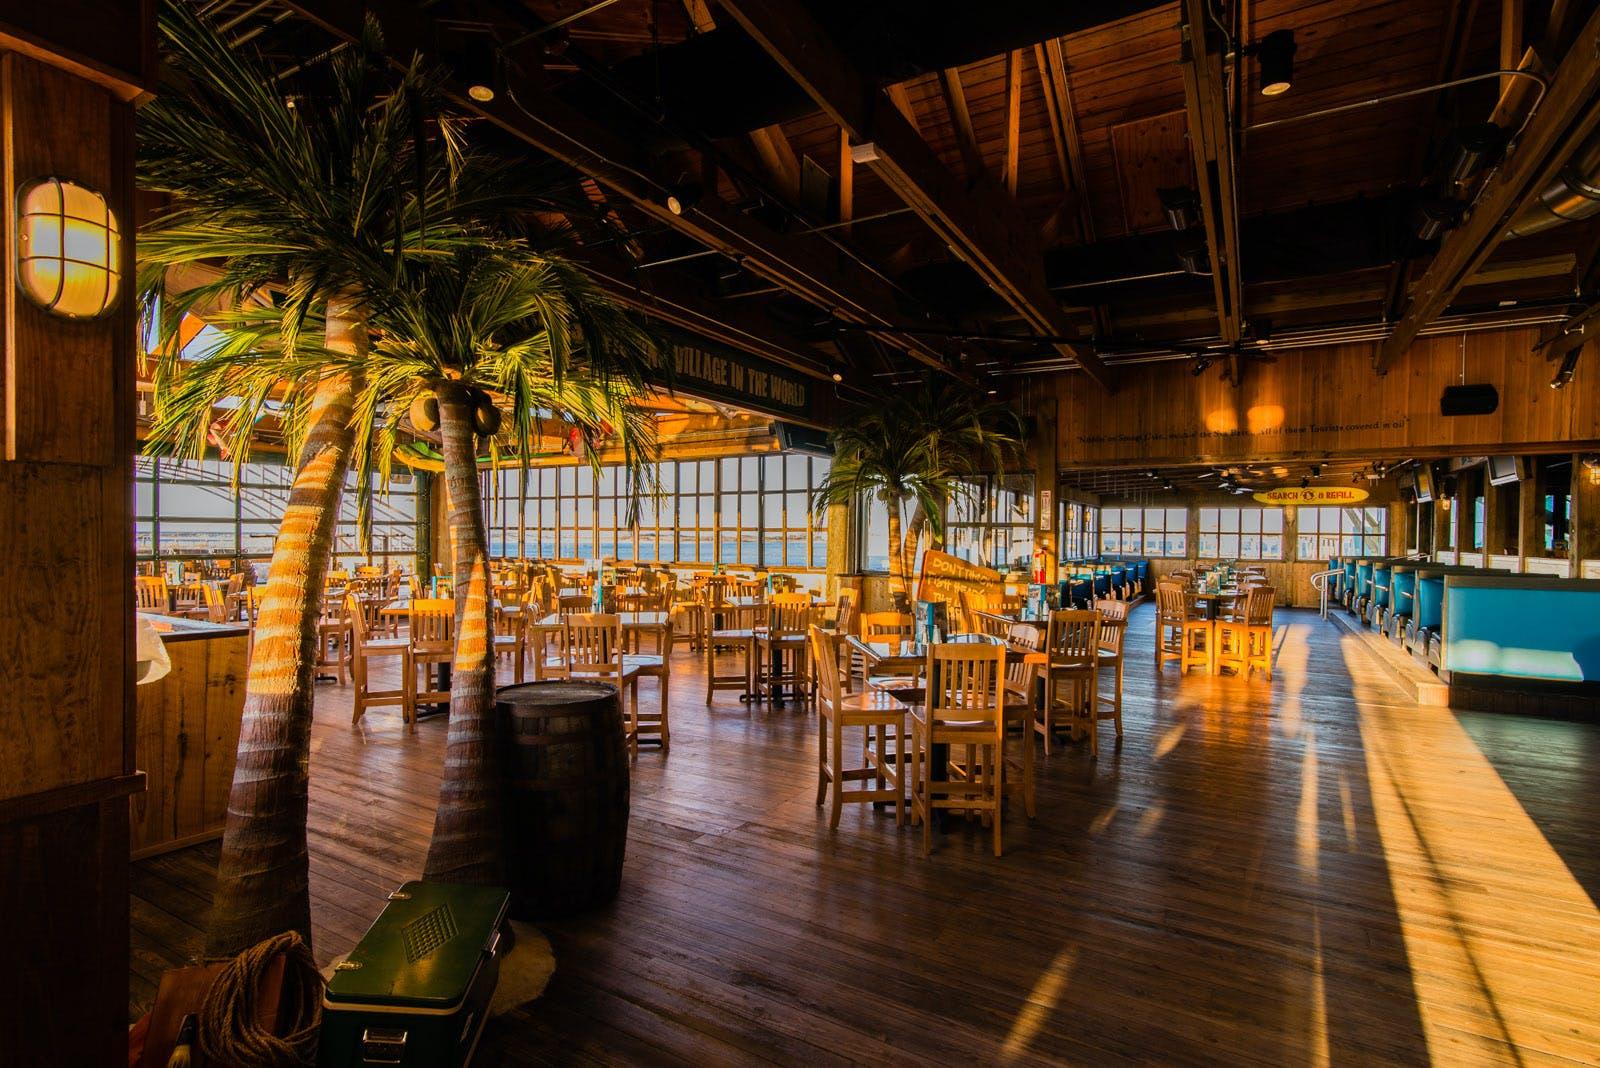 Margaritaville restaurant and retail destin fl the